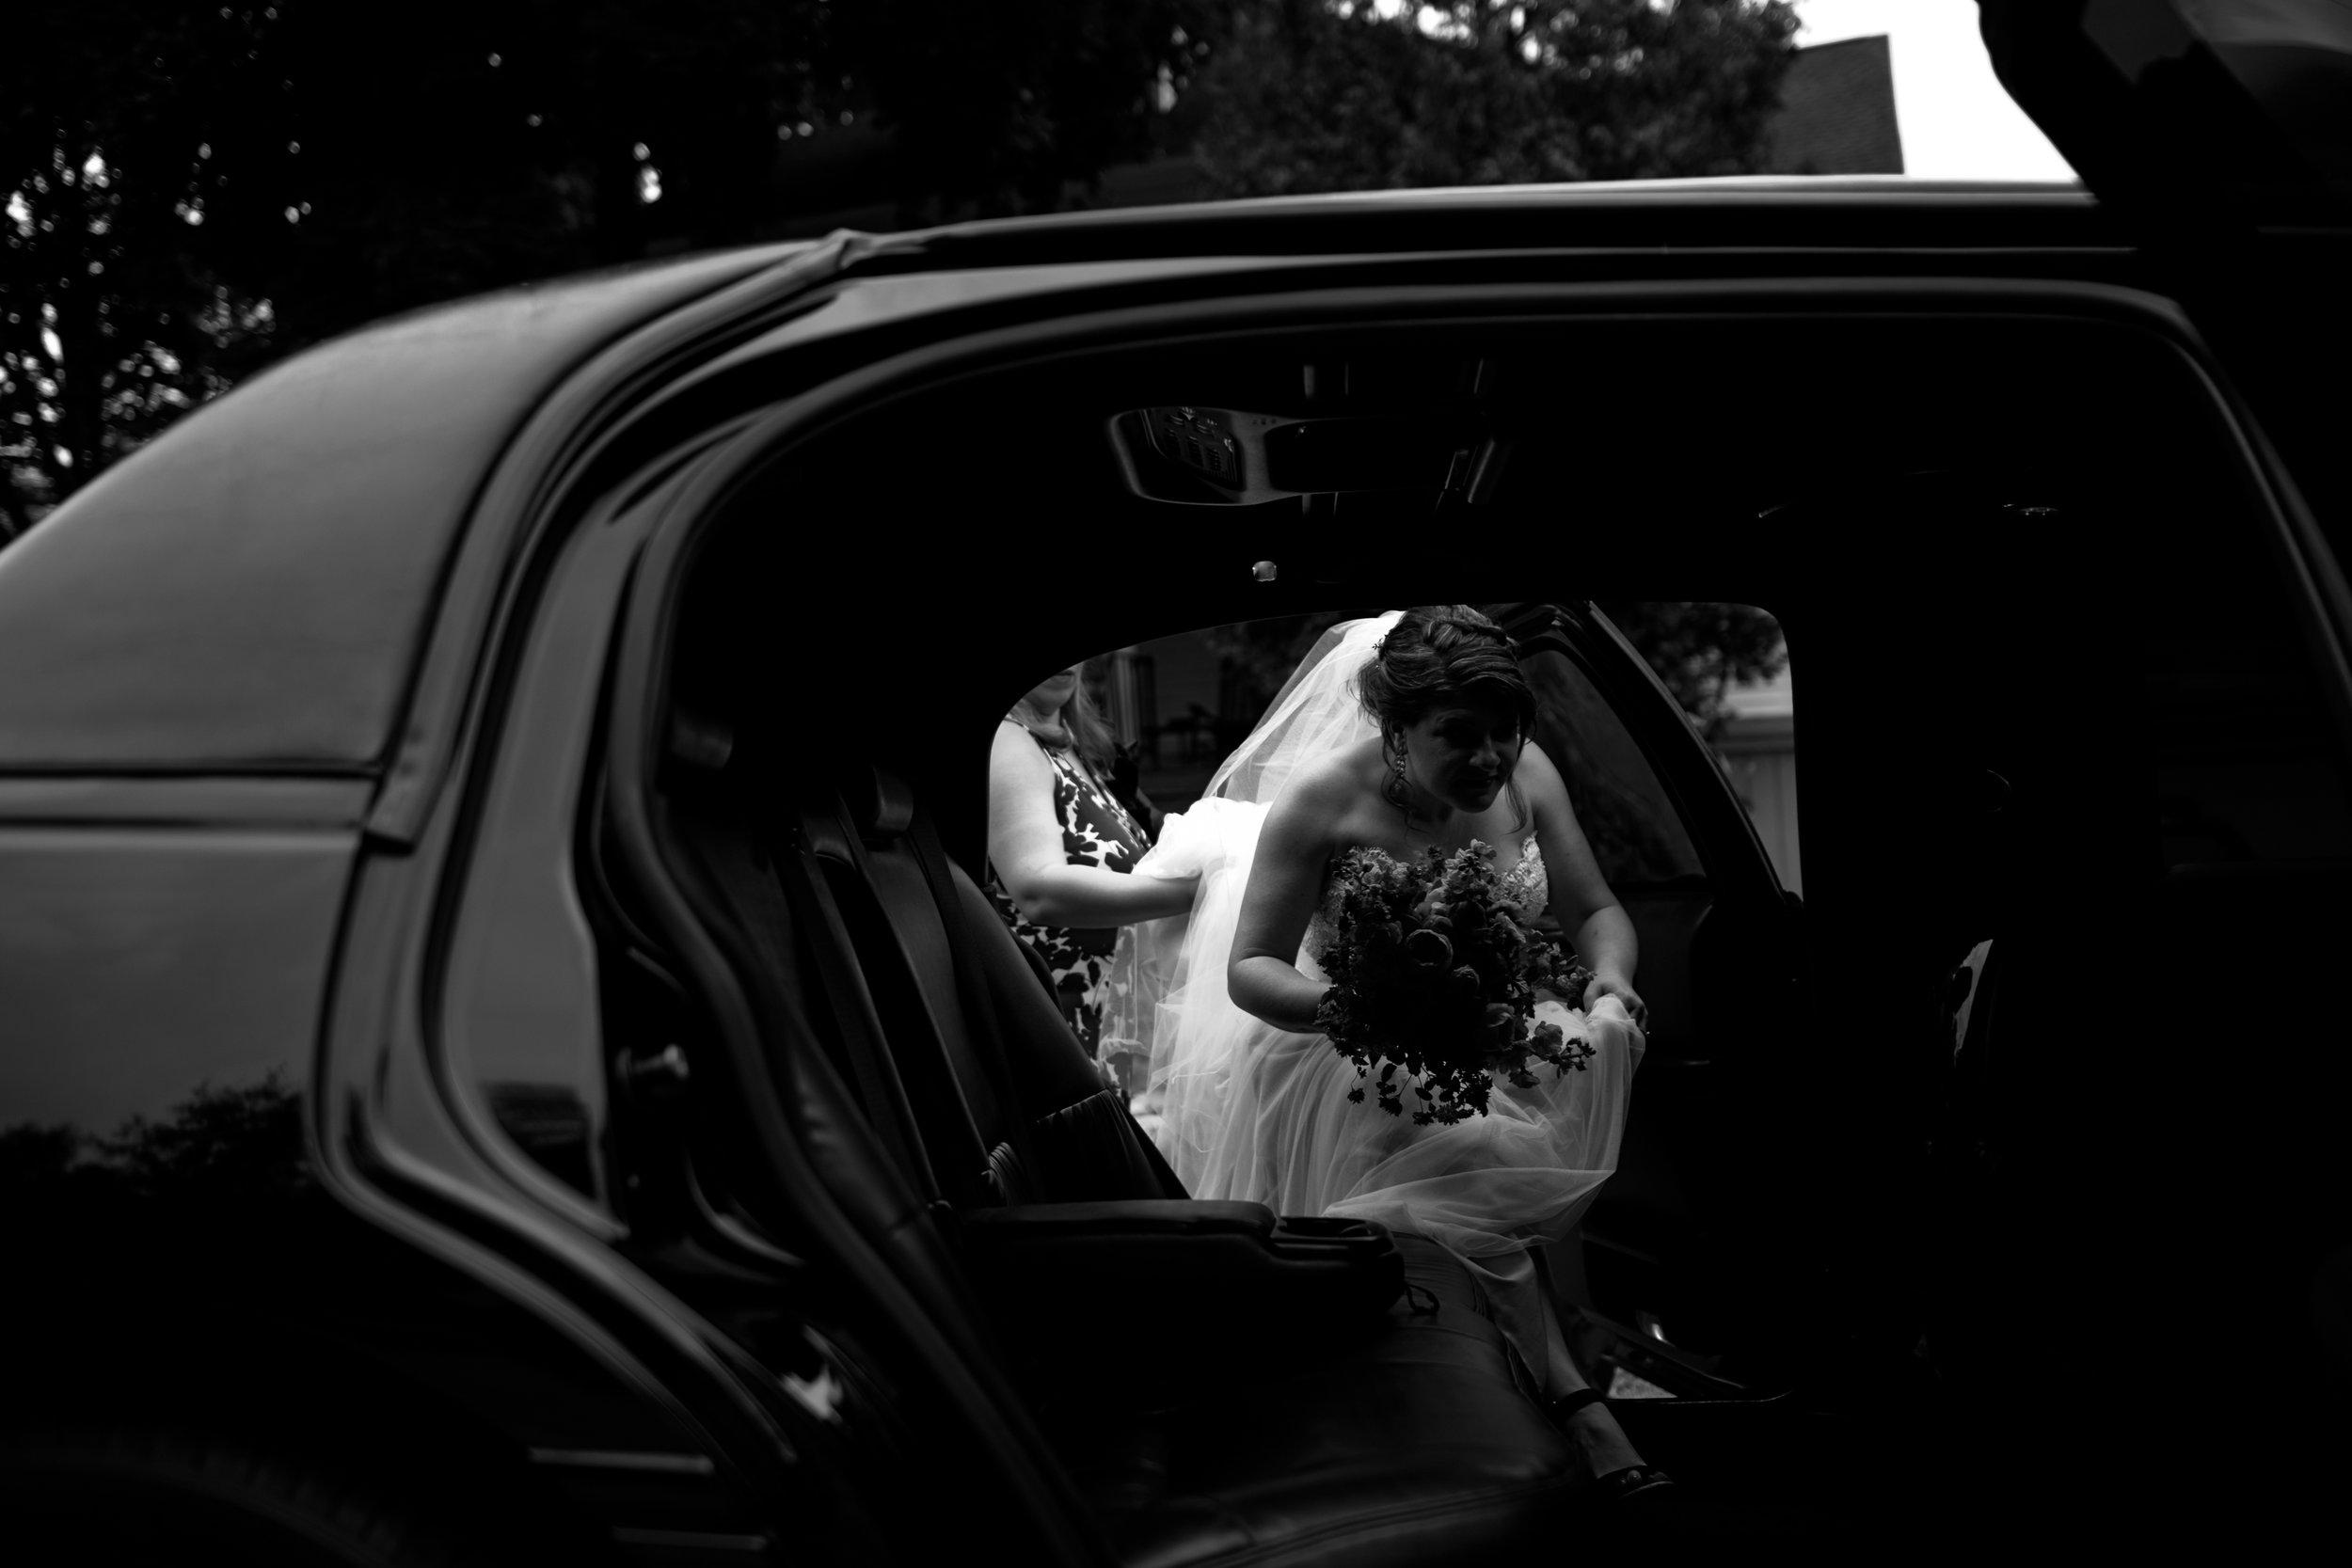 gunstock-mountain-resort-wedding-photos-05.JPG